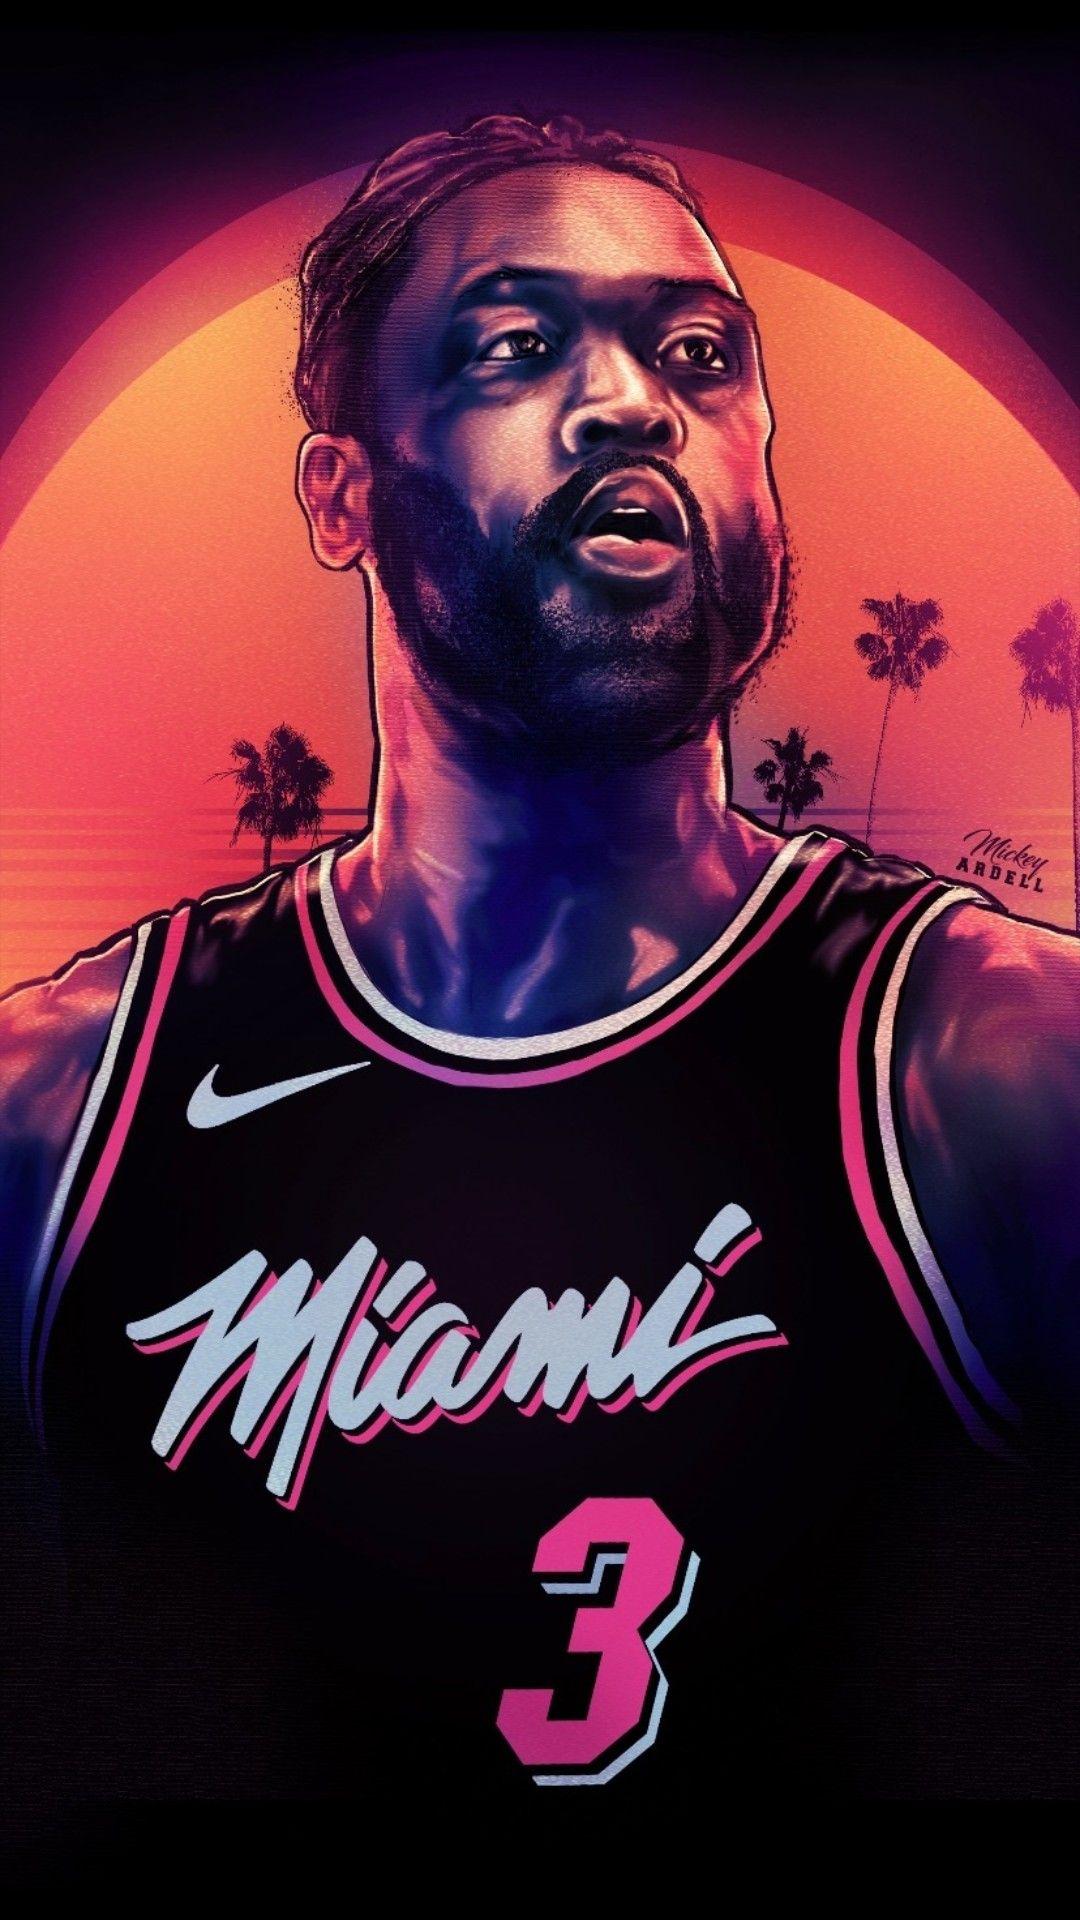 Nba중계 스포츠중계 해외스포츠중계 프리미어리그중계 Epl중계 Mlb중계 Www Bbtv24 Com Mvp Basketball Nba Mvp Nba Basketball Art